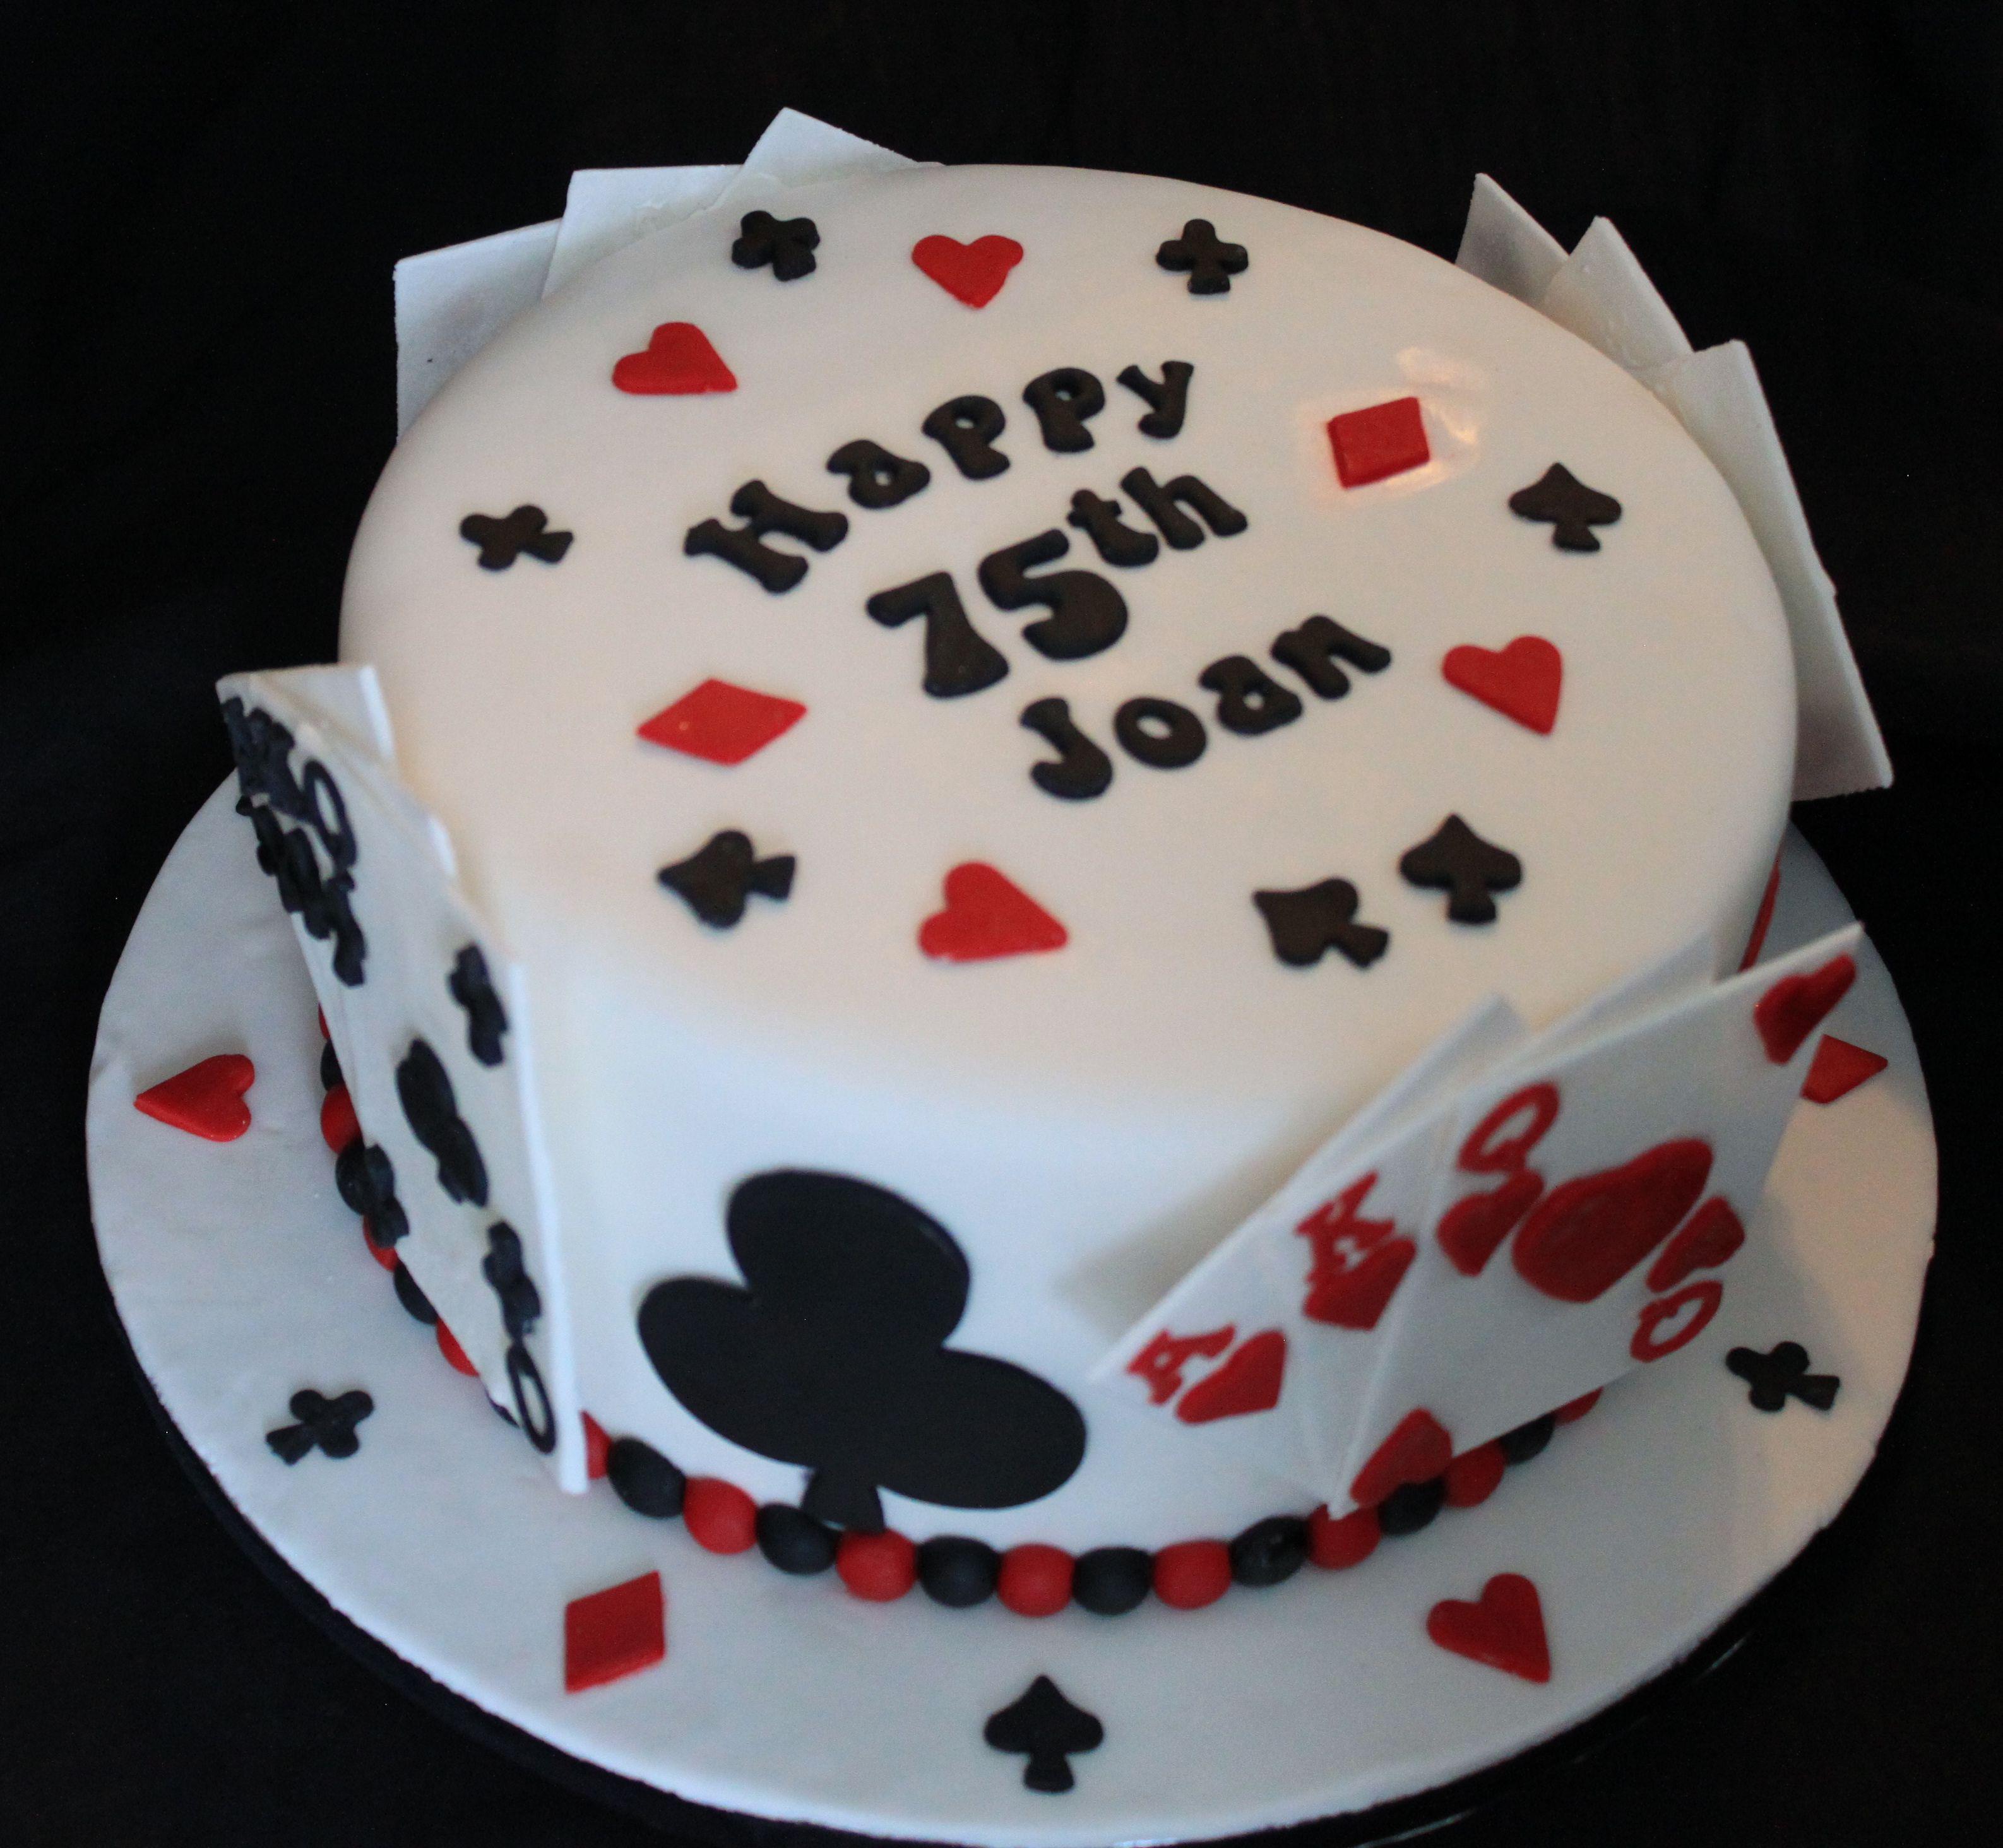 Card player cake